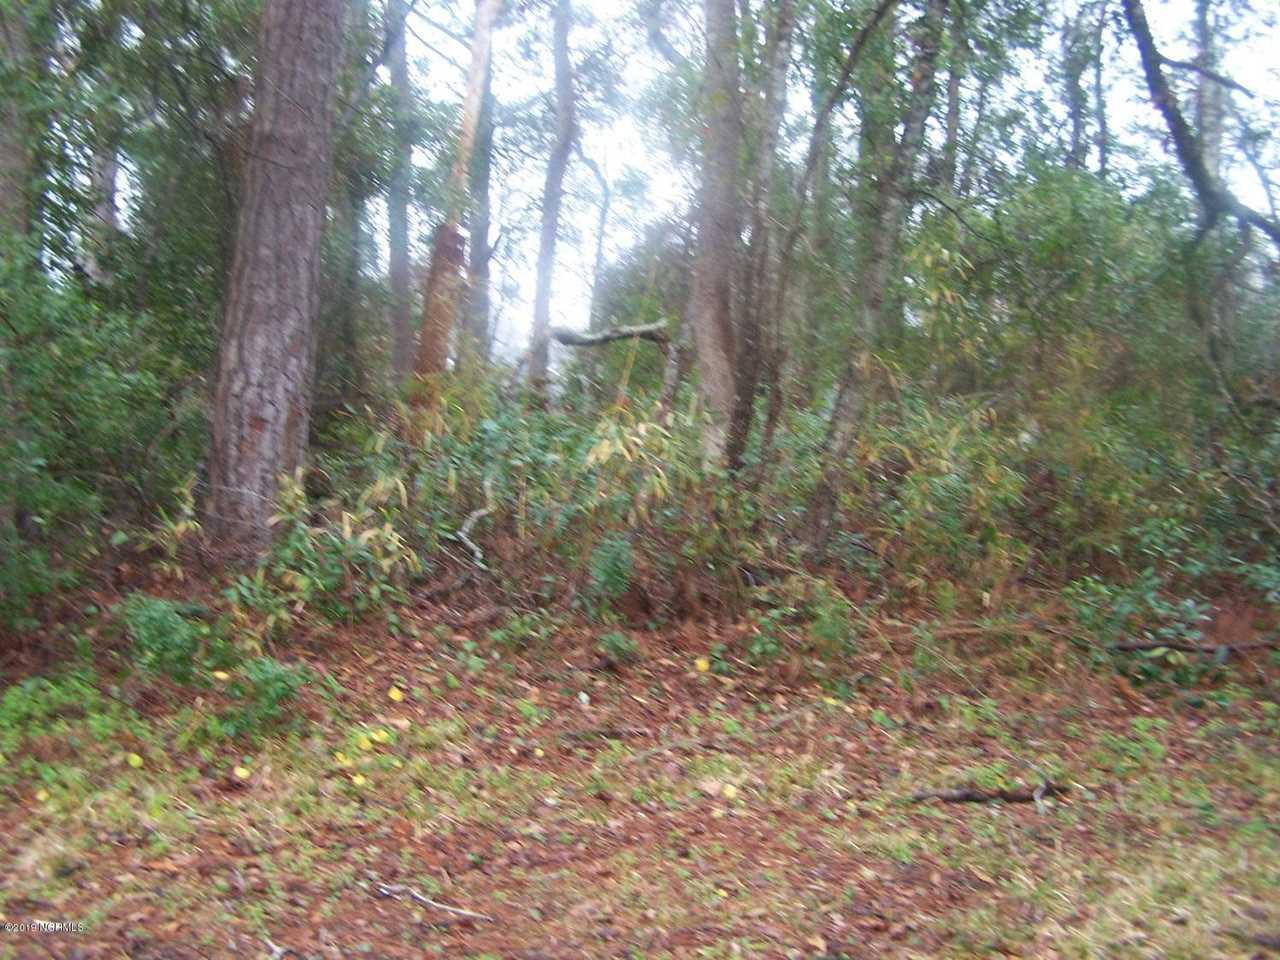 L-31 NW 21st Street Oak Island Wooded, NC 28465 | MLS 100150010 Photo 1